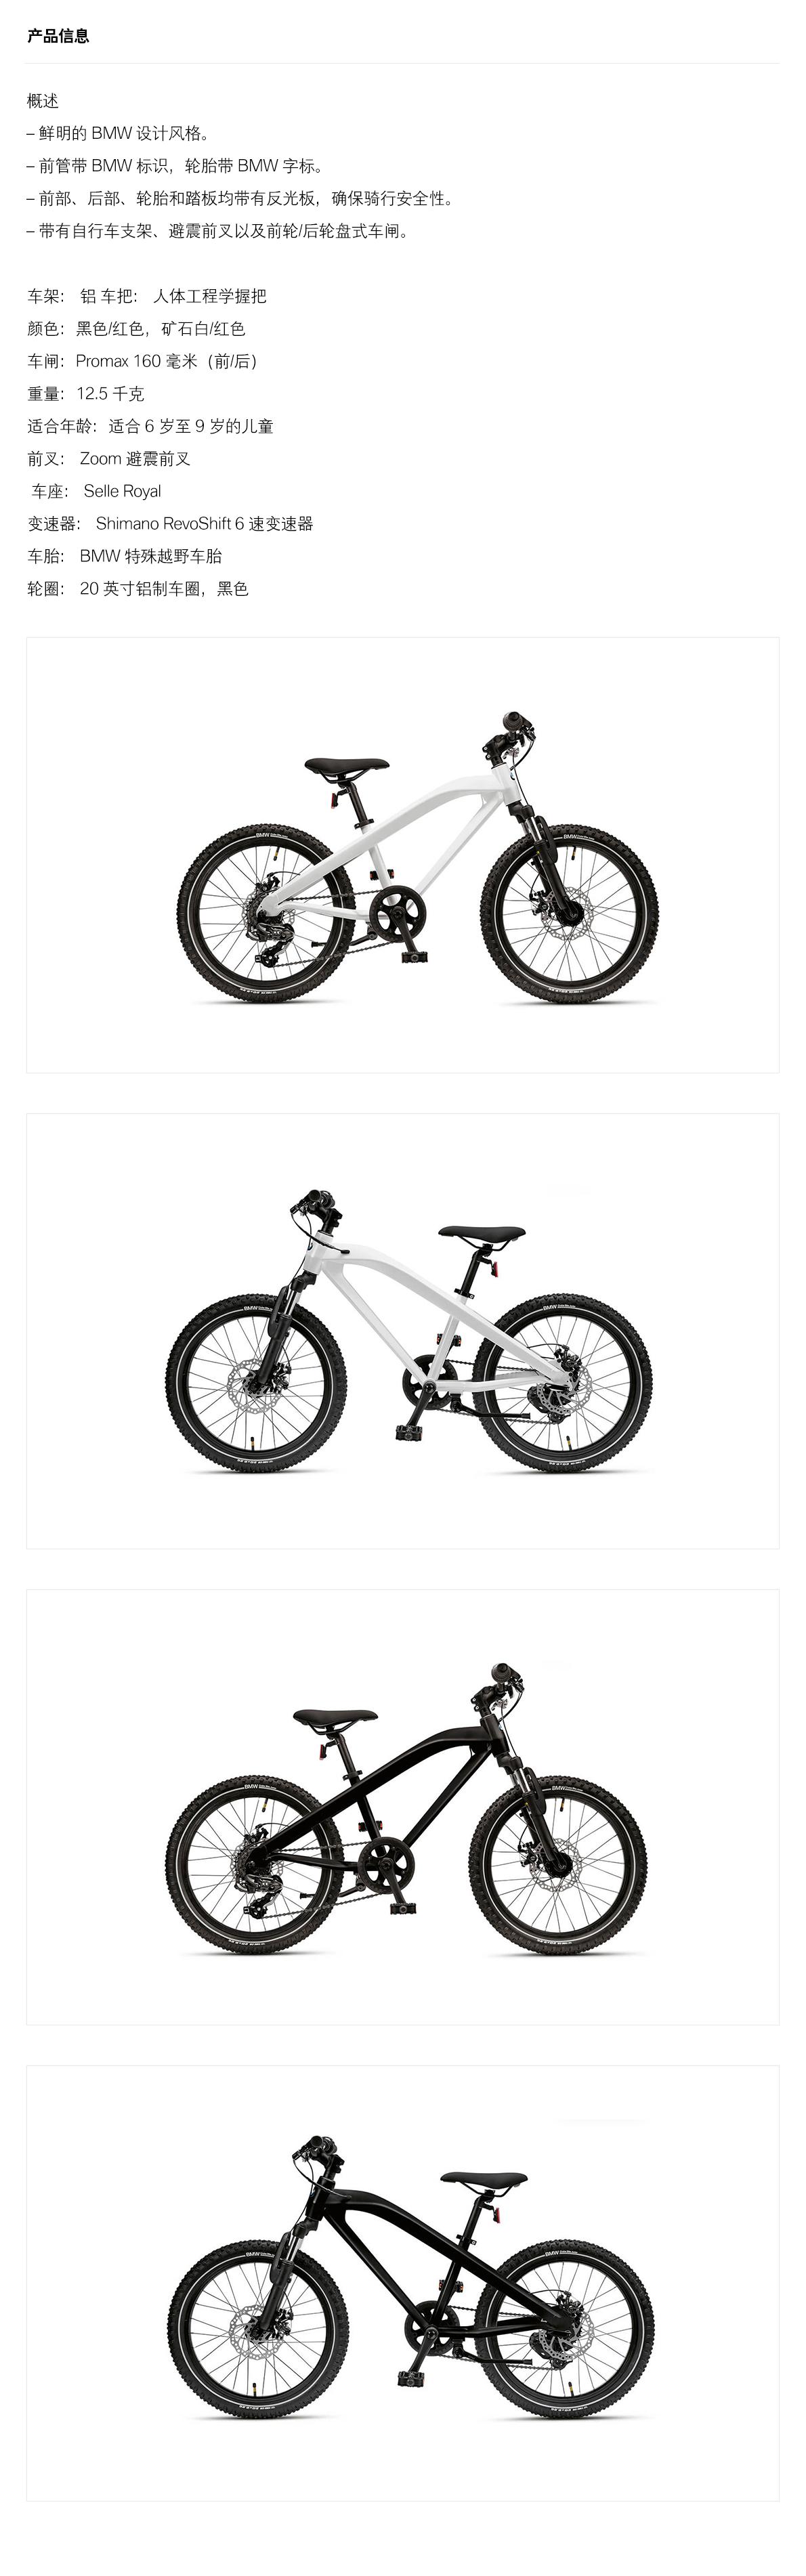 BMW 少年款休闲自行车